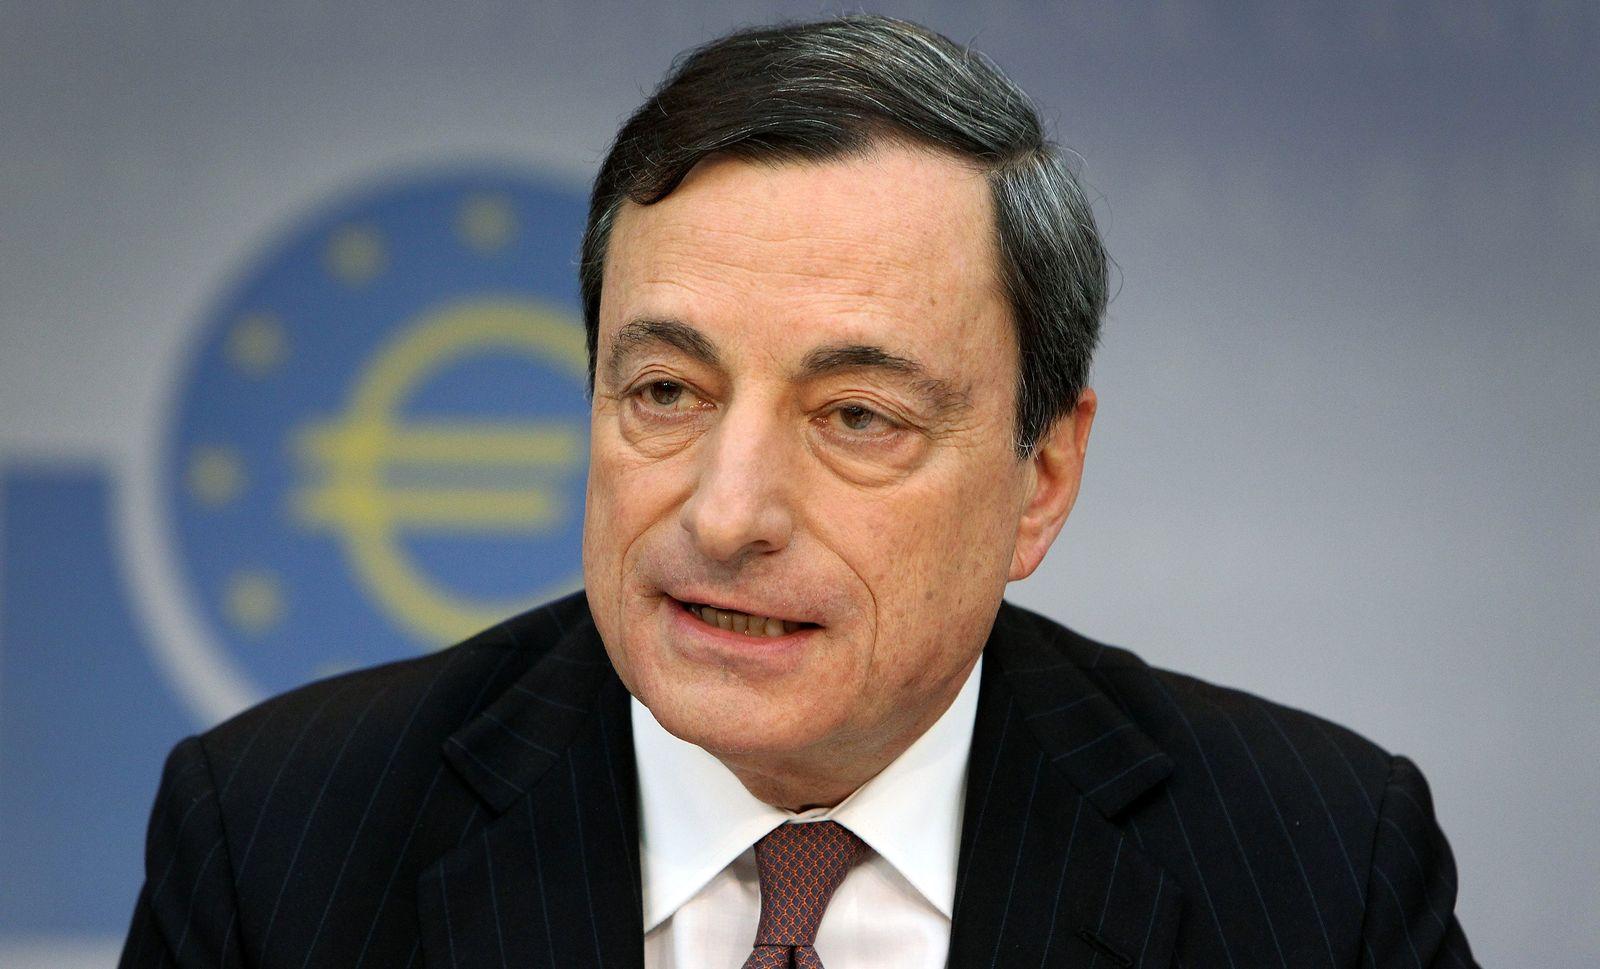 GERMANY-FINANCE-ECB-EUROZONE-MONEY-RATES